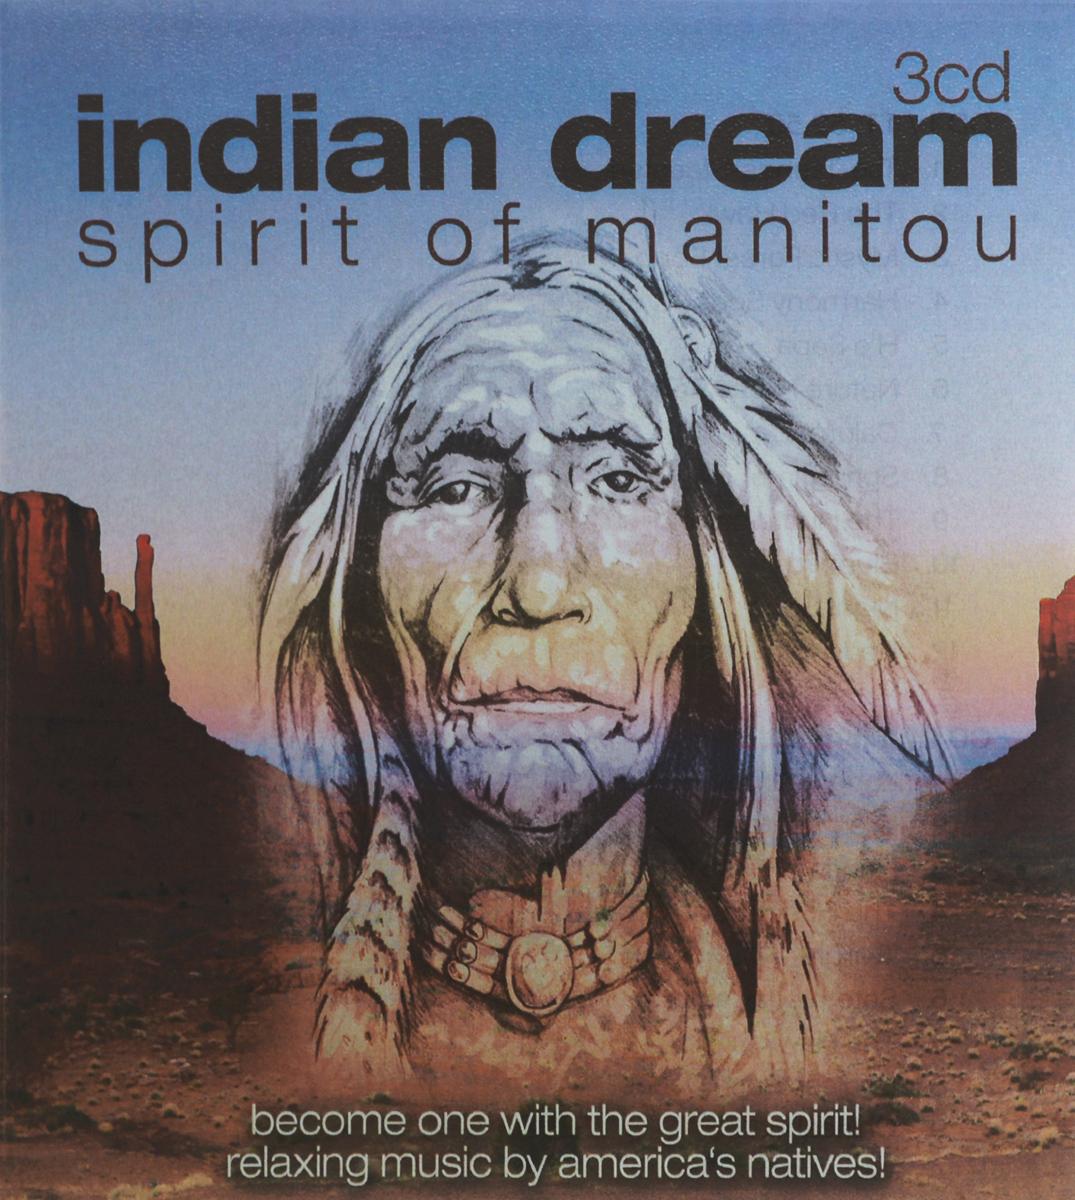 Lakota Natives,Ambros The Fluteman,Indian Spirit Orchestra Indian Dream. Spirit Of Manitou (3 CD) майка классическая printio the spirit of munro indian